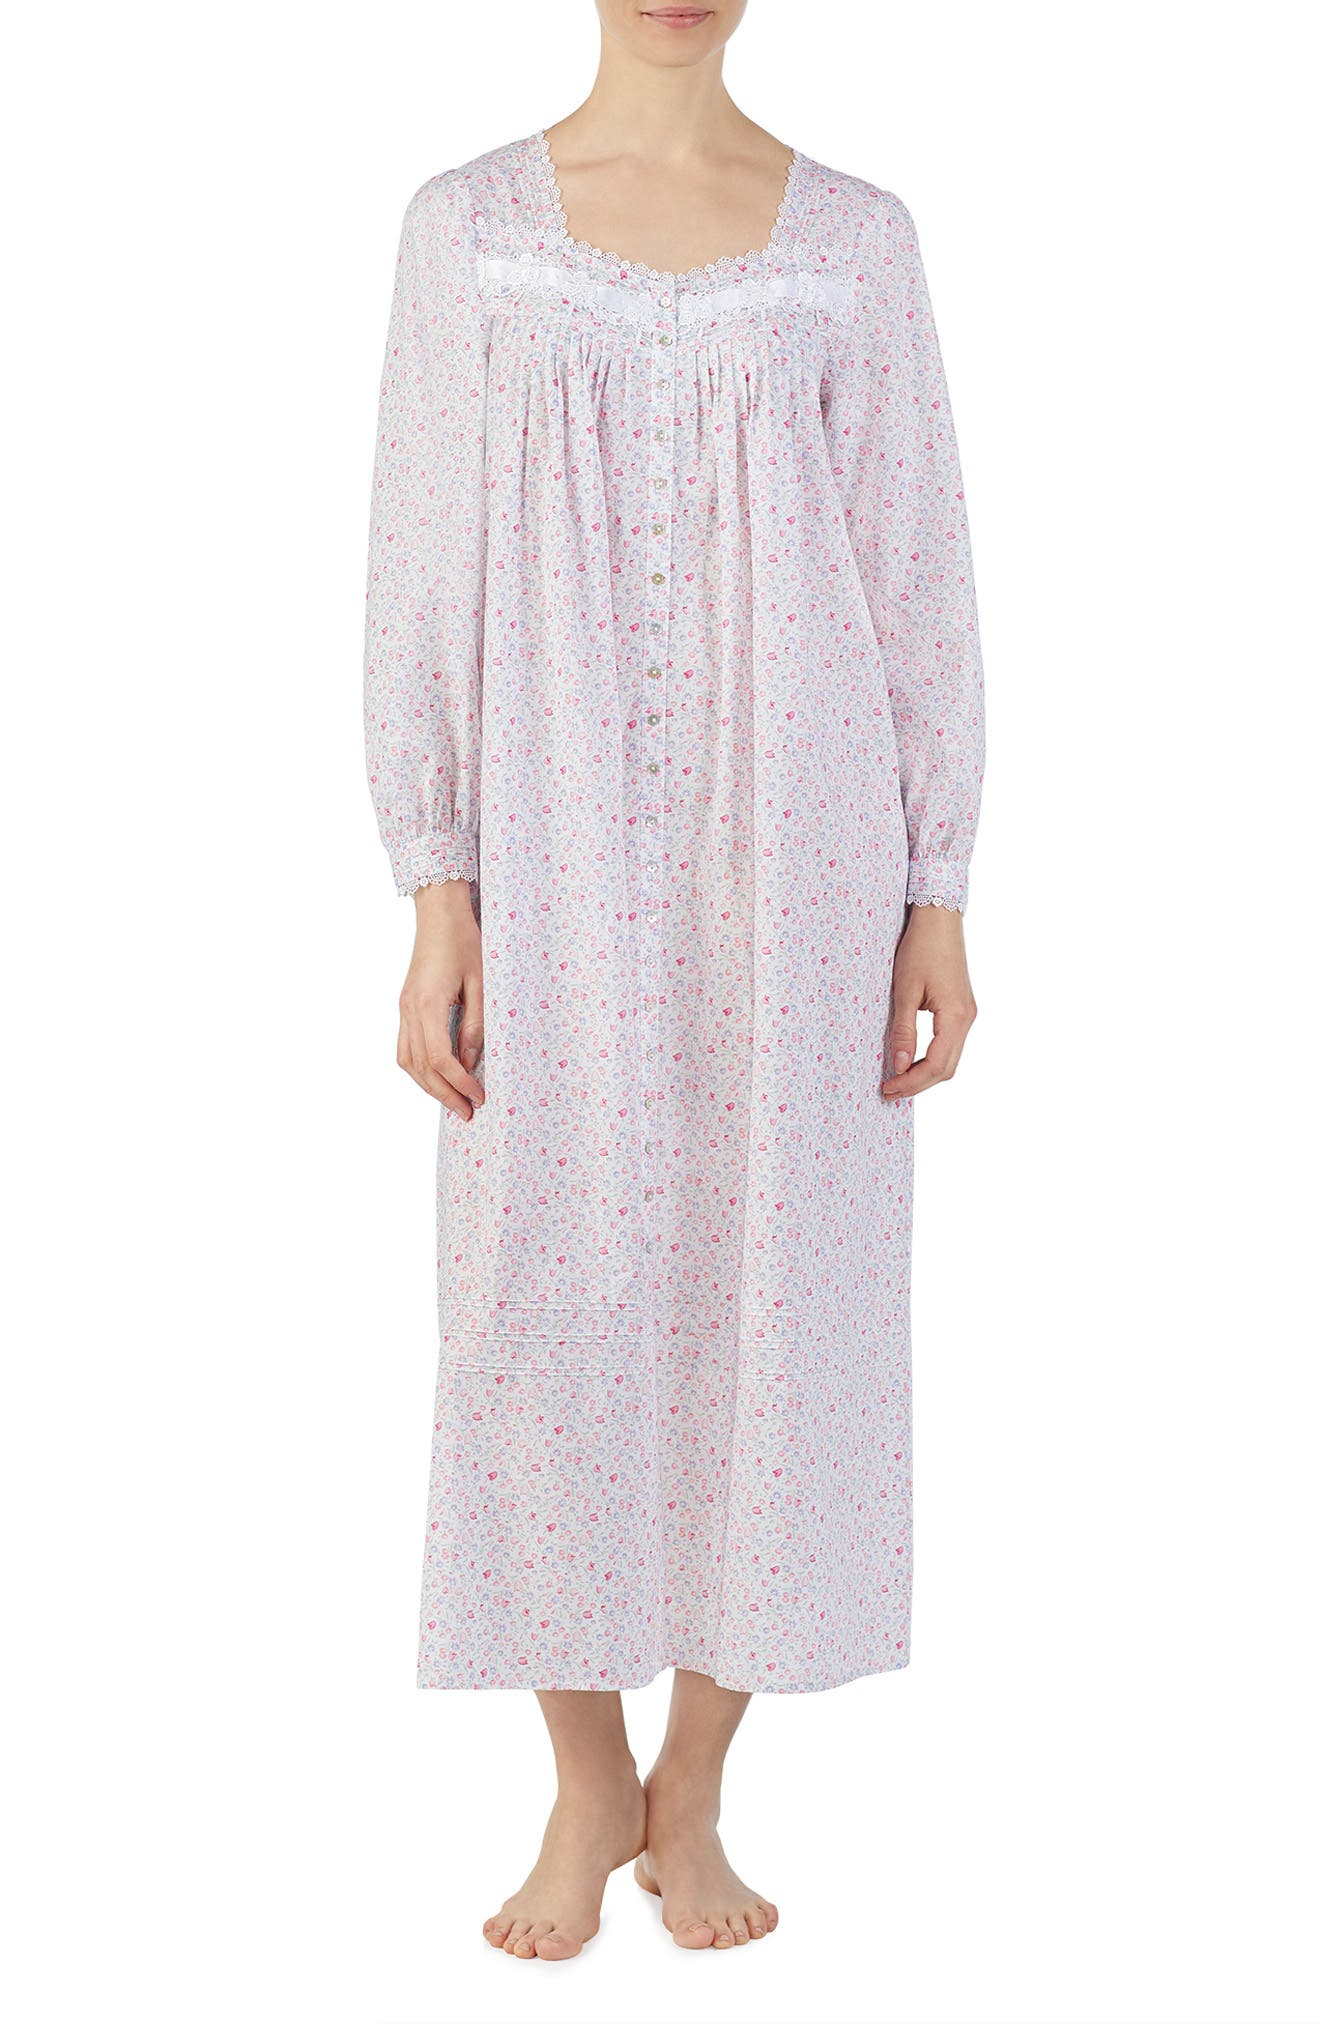 Eileen West Cotton Button Front Nightgown, White